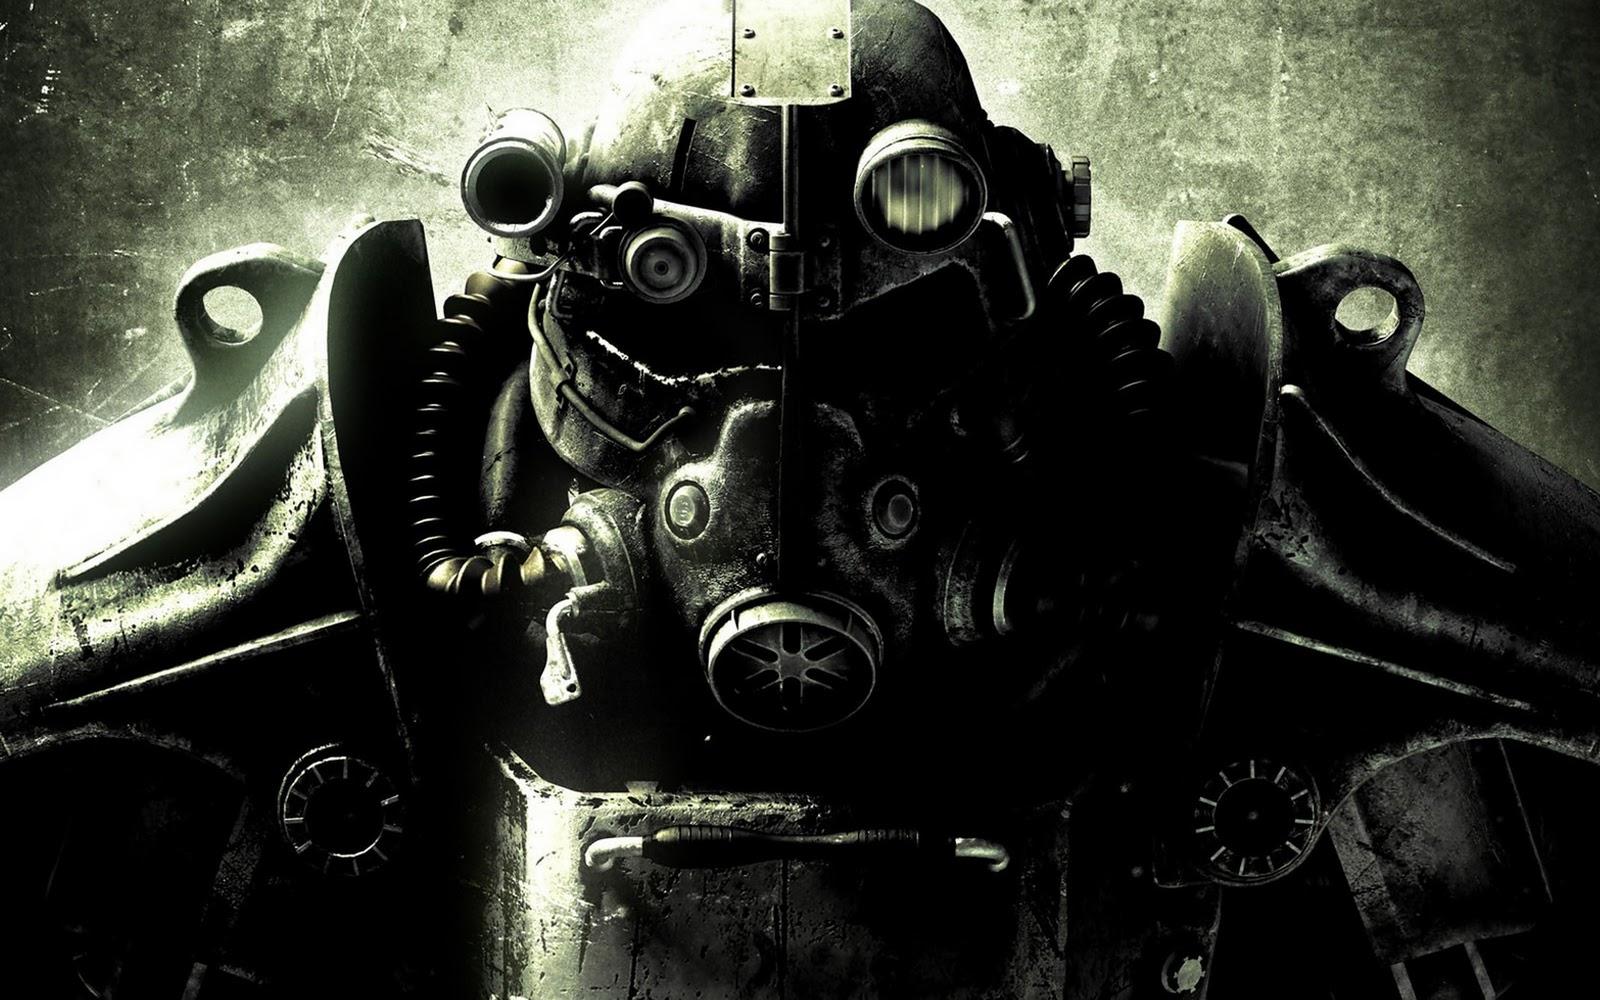 49 Fallout Brotherhood Of Steel Wallpaper On Wallpapersafari